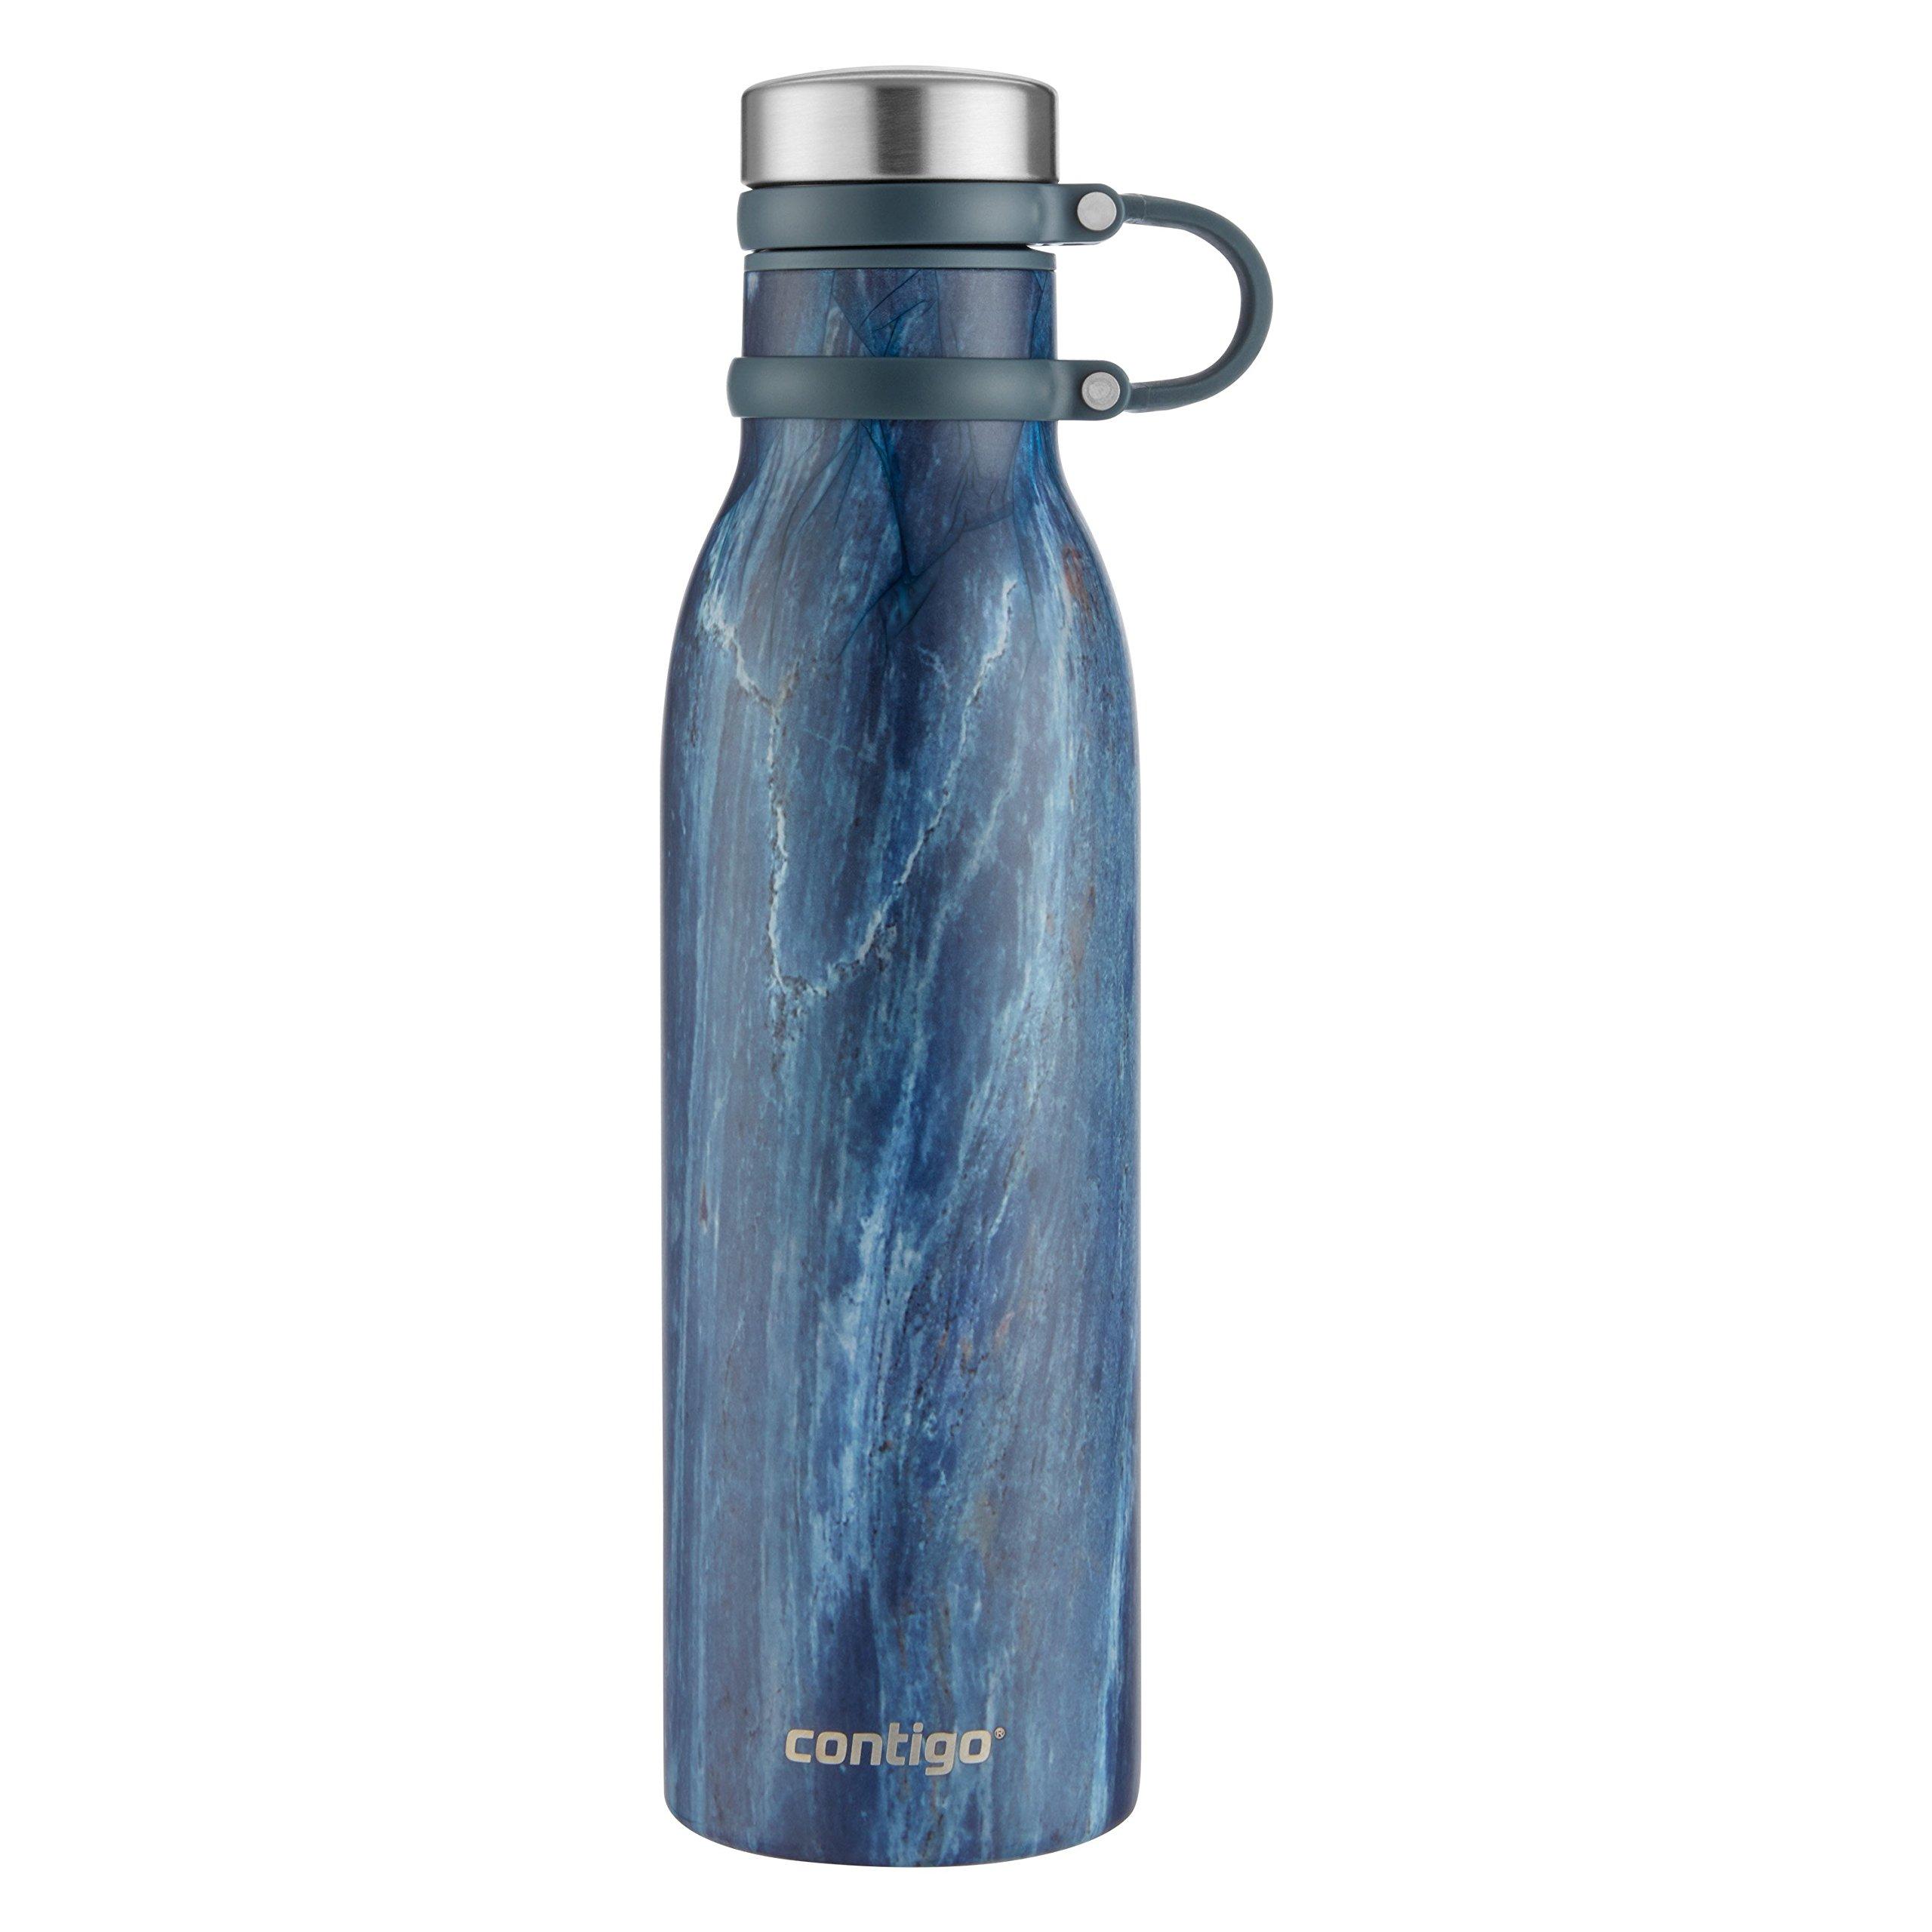 Contigo Couture Vacuum-Insulated Stainless Steel Water Bottle, 20 oz, Blue Slate by Contigo